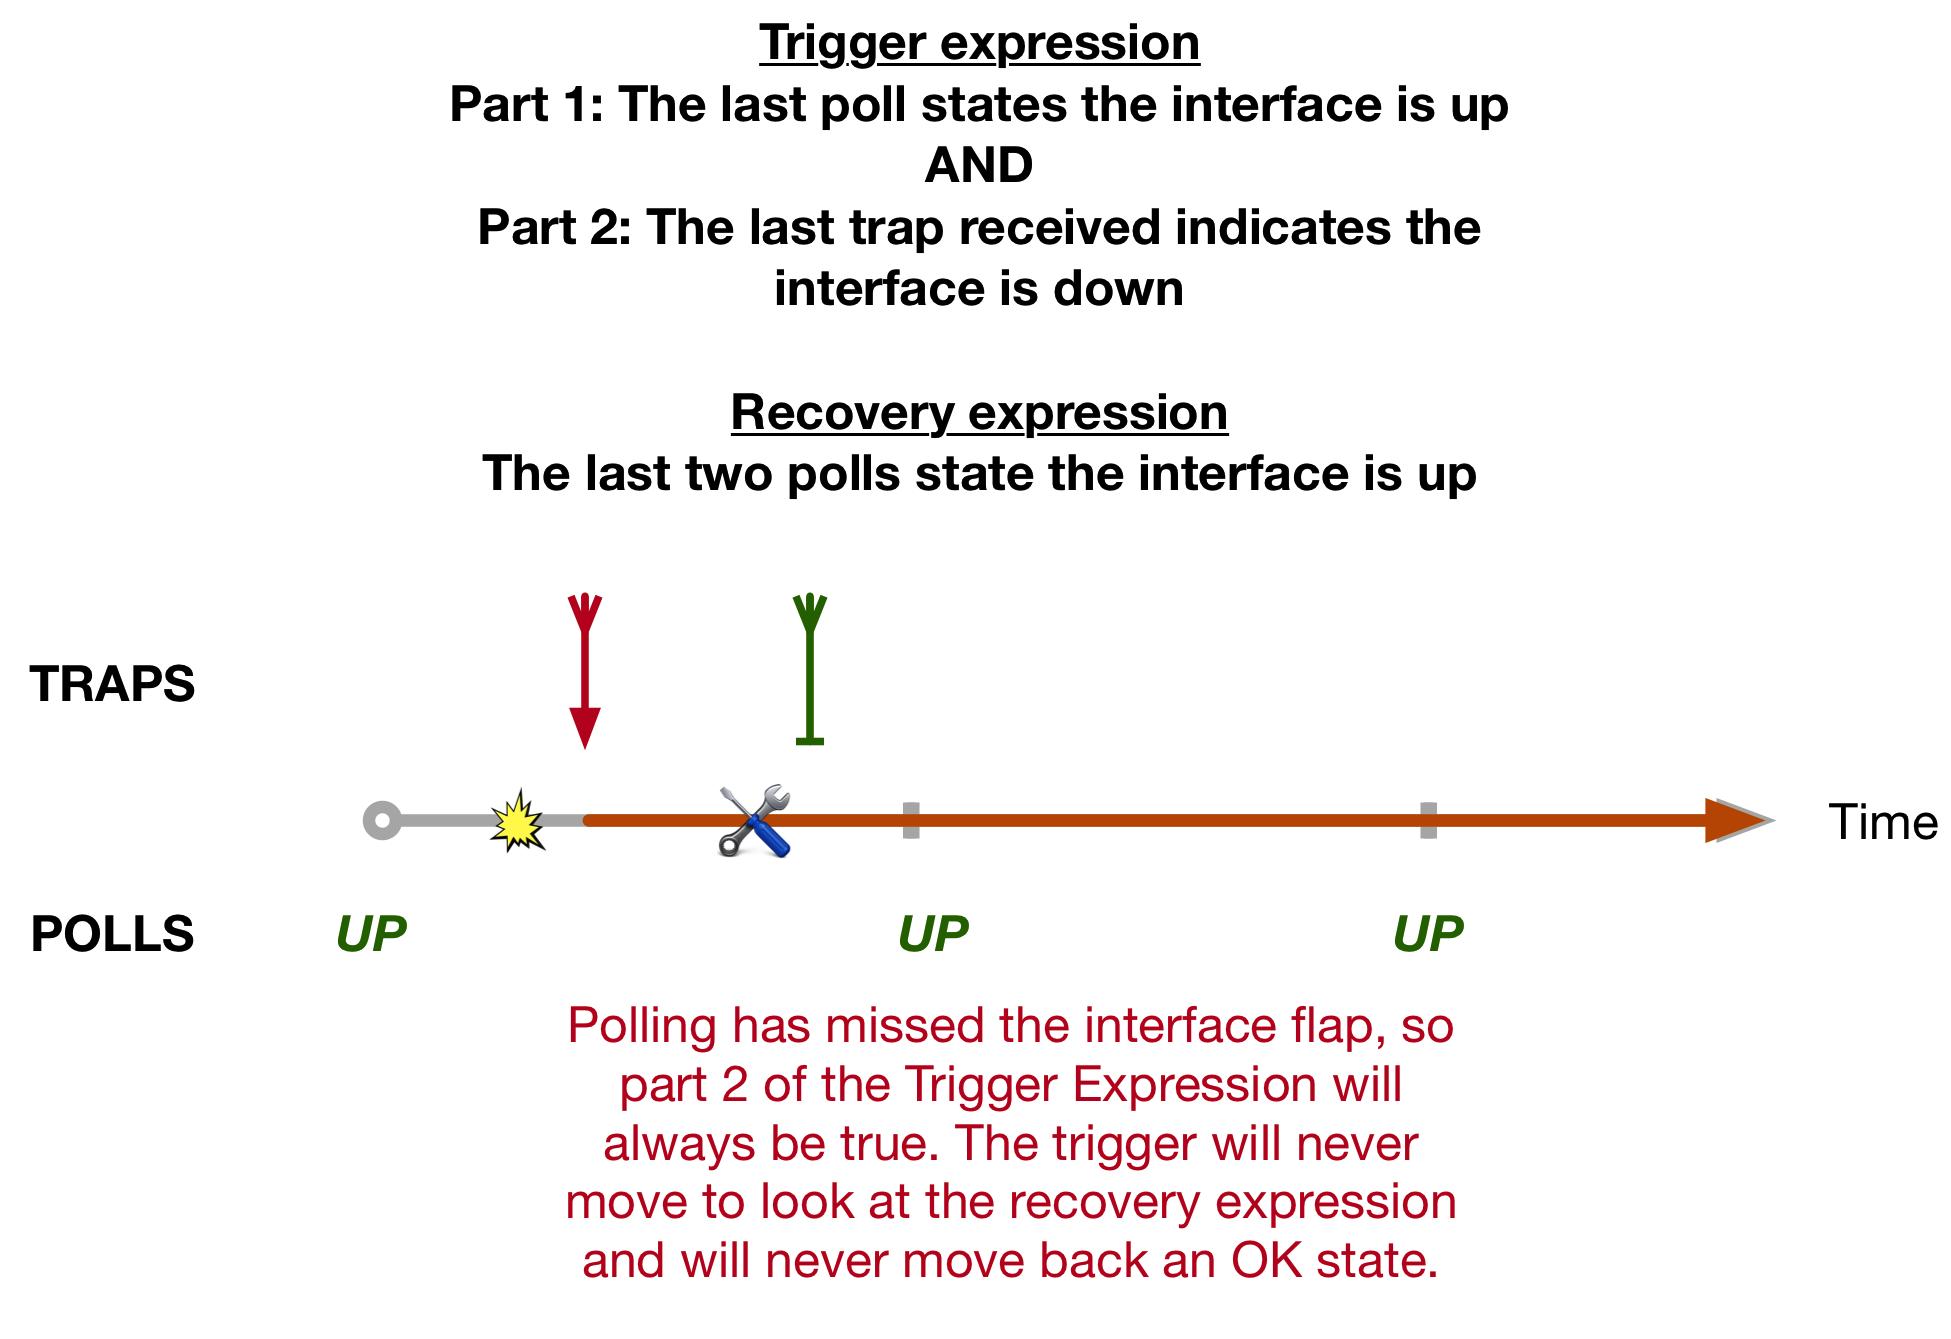 blog8_image12_diagram7